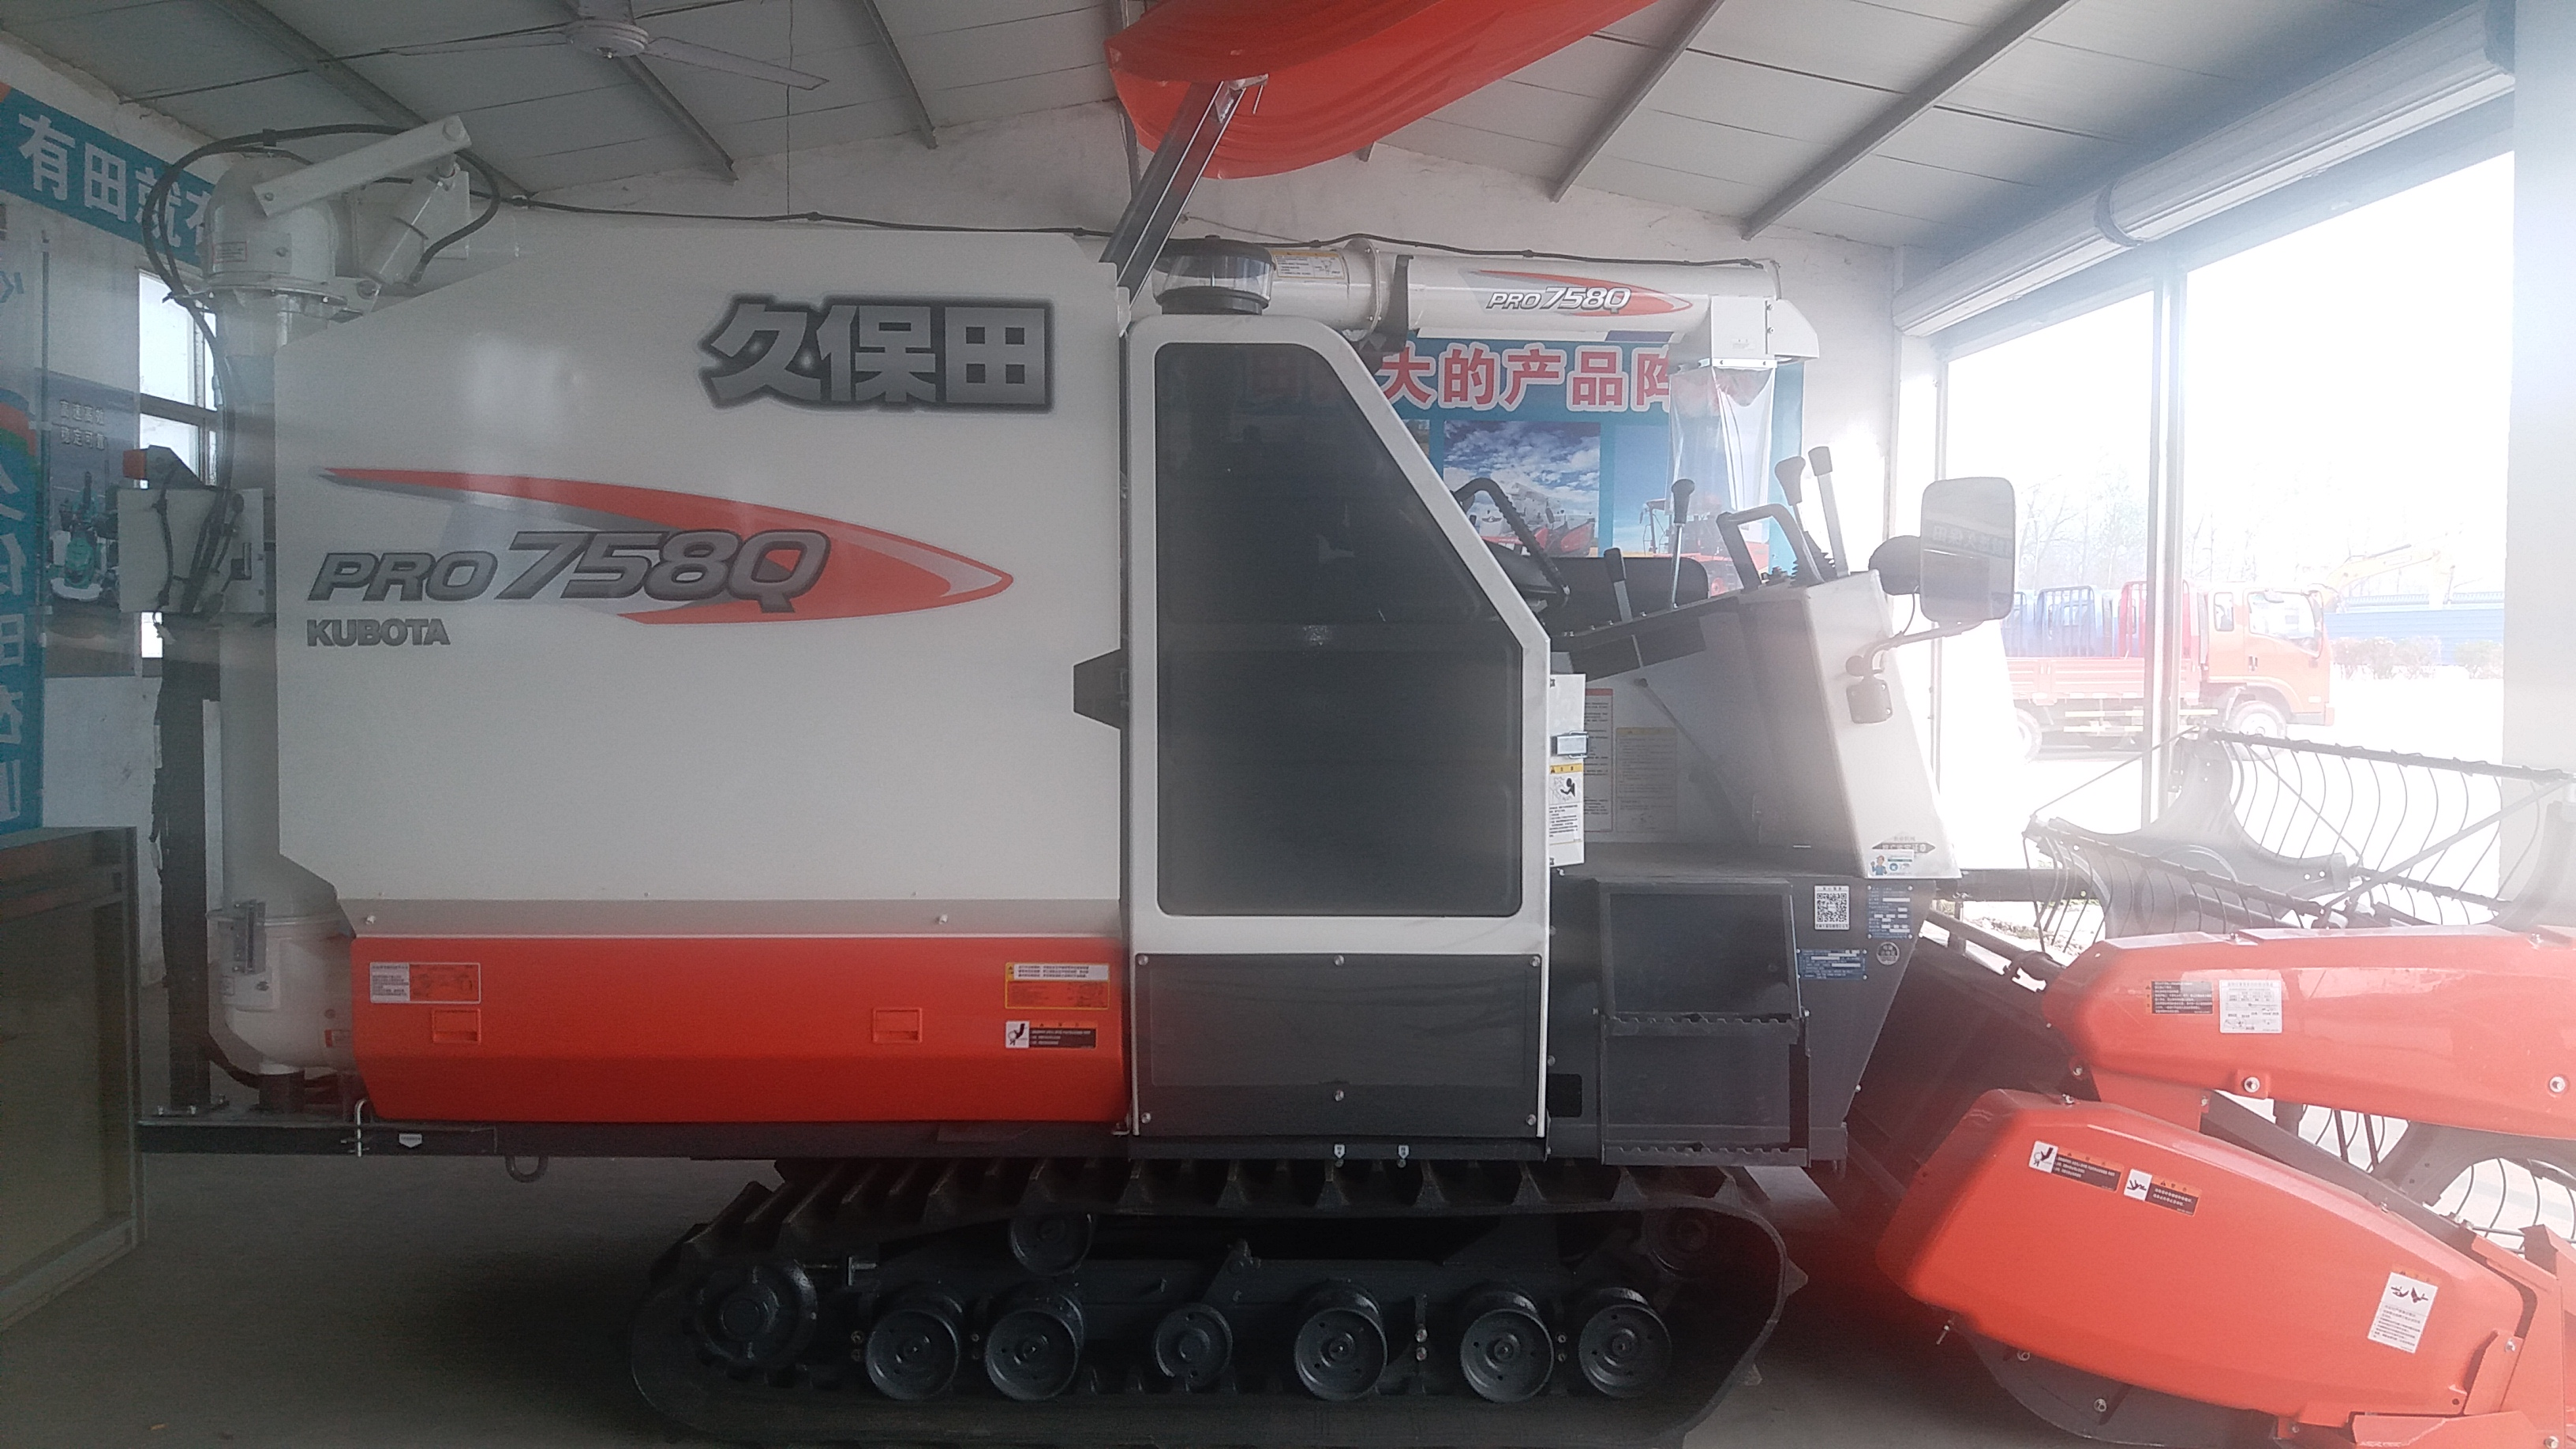 4LZ-3(PRO758Q) For Agriculture 988Q Kubota Rice Combine Harvester Machine